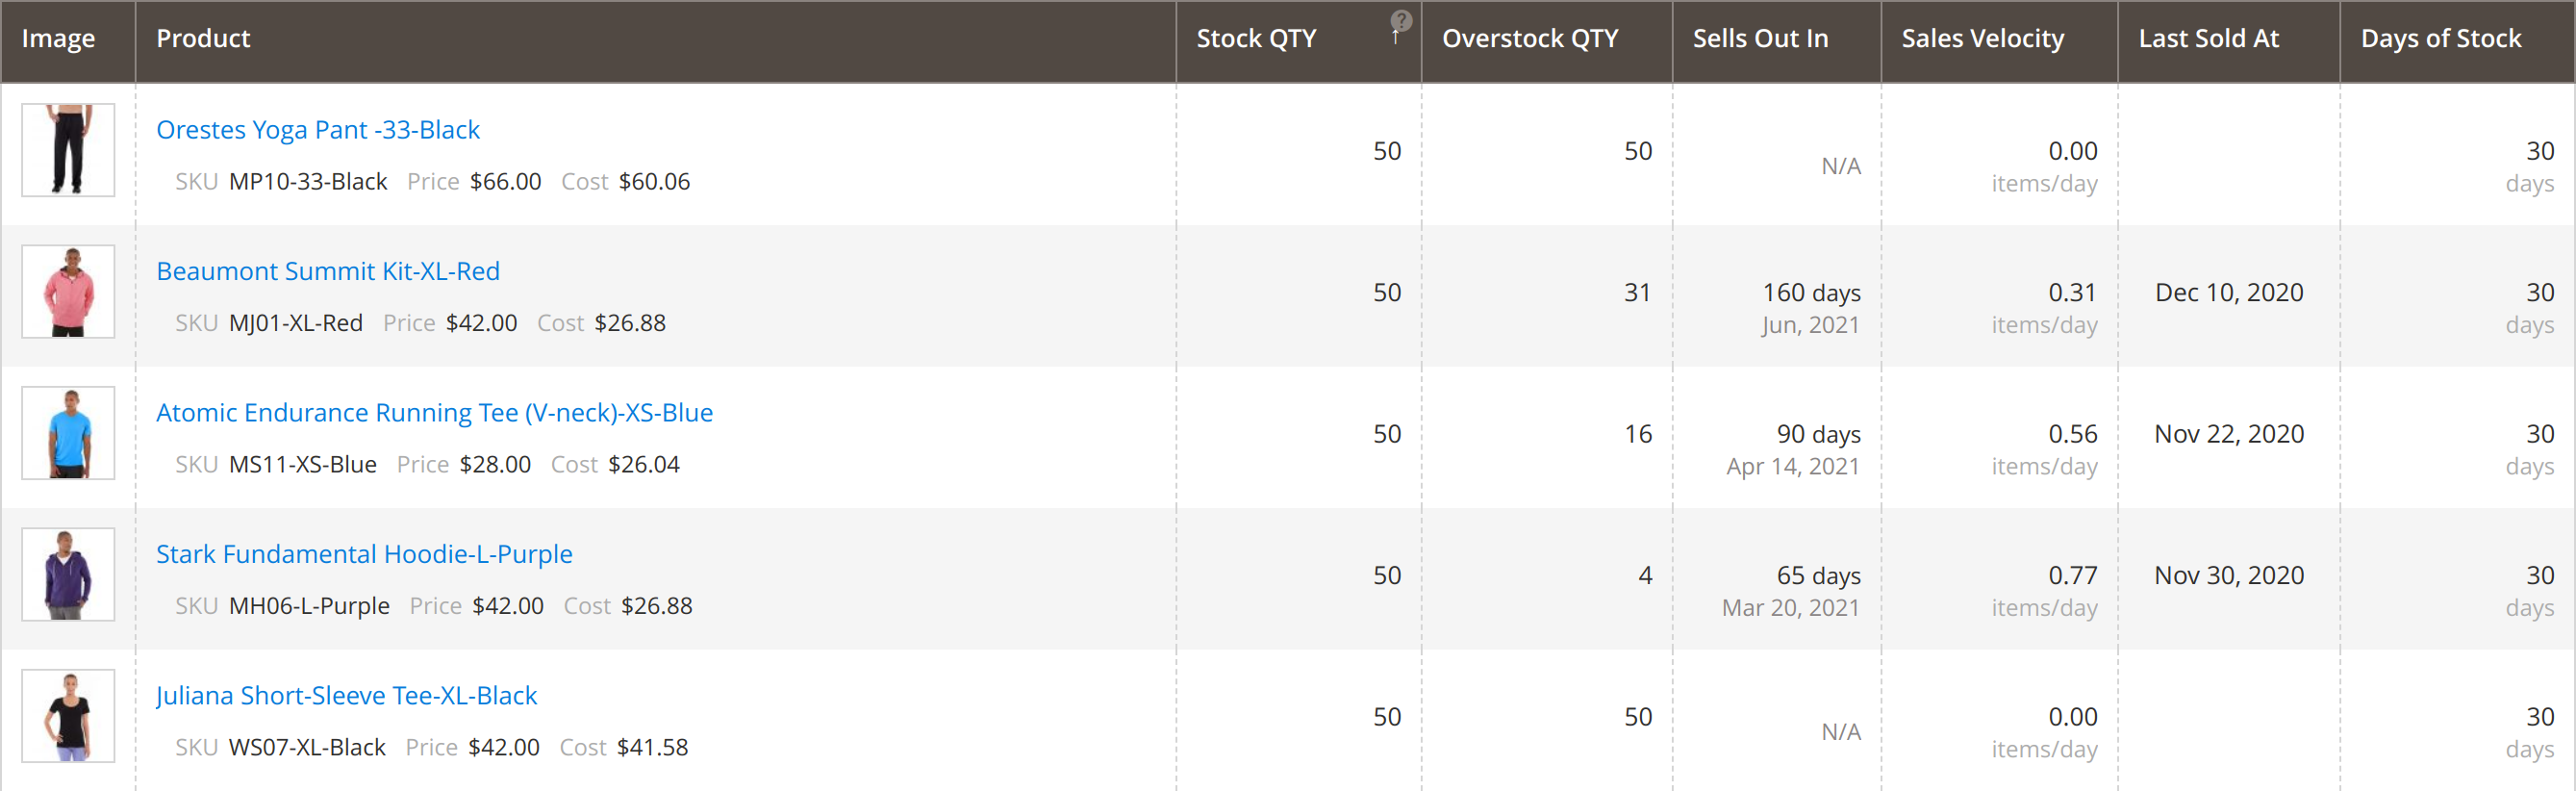 Overstock grid in Mirasvit Magento 2 Inventory Planner extension.